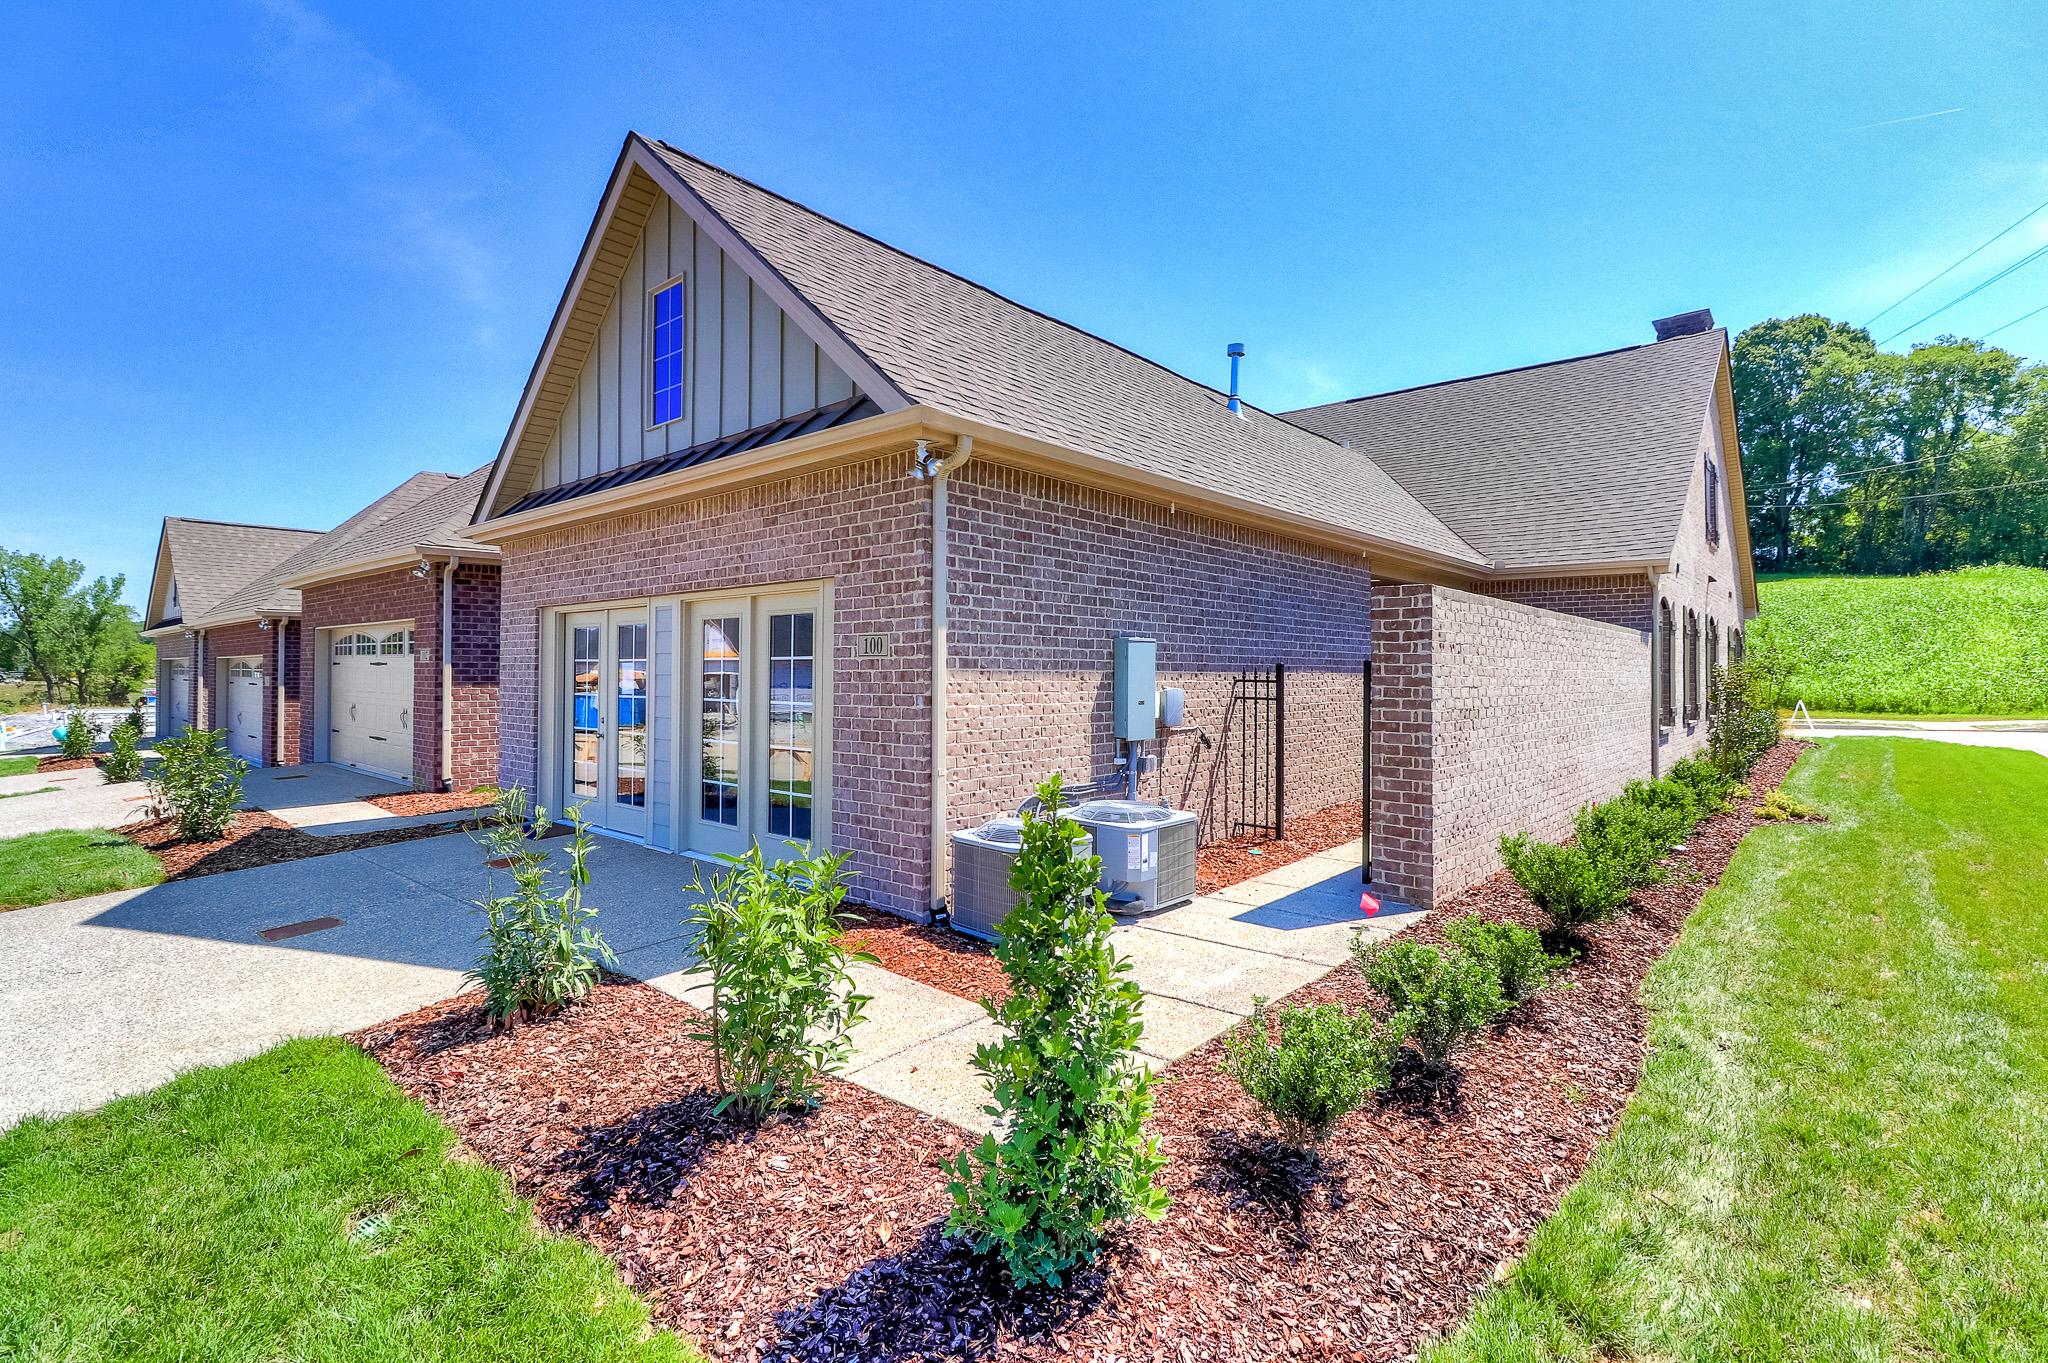 Groves Serve Subdivision Homes for Sale Mount Juliet TN